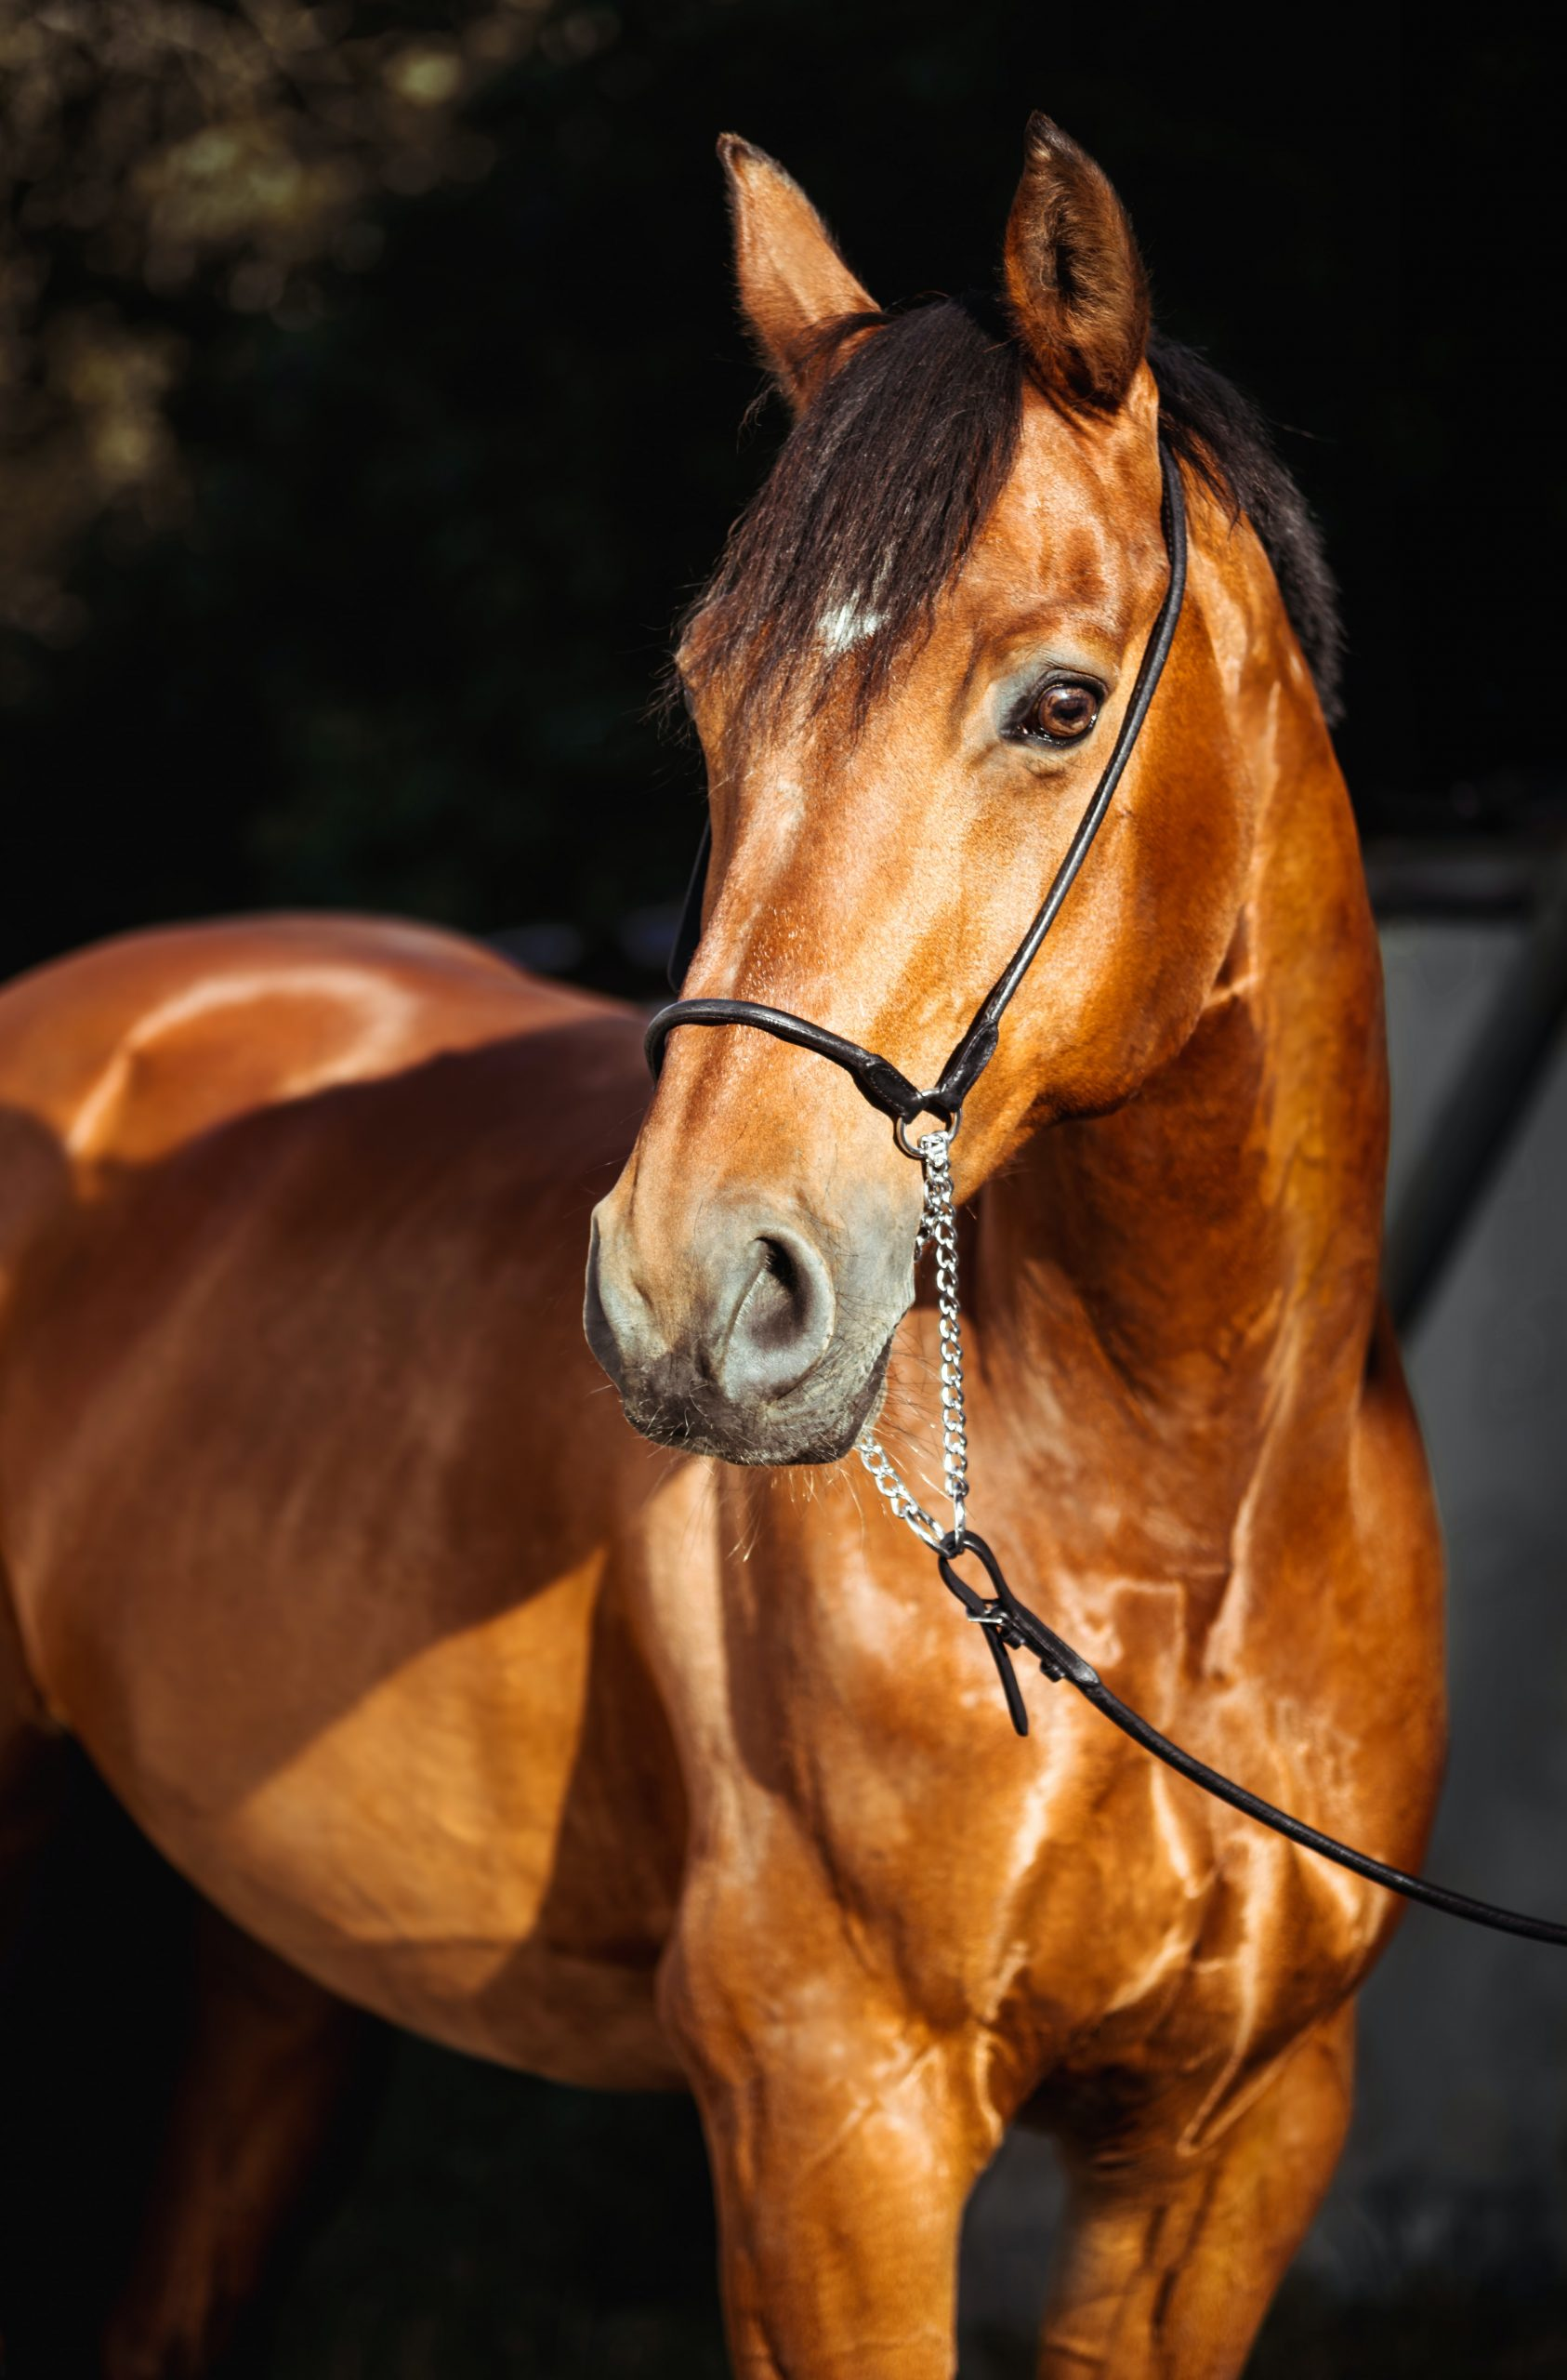 horse first aid course nkc equestrian